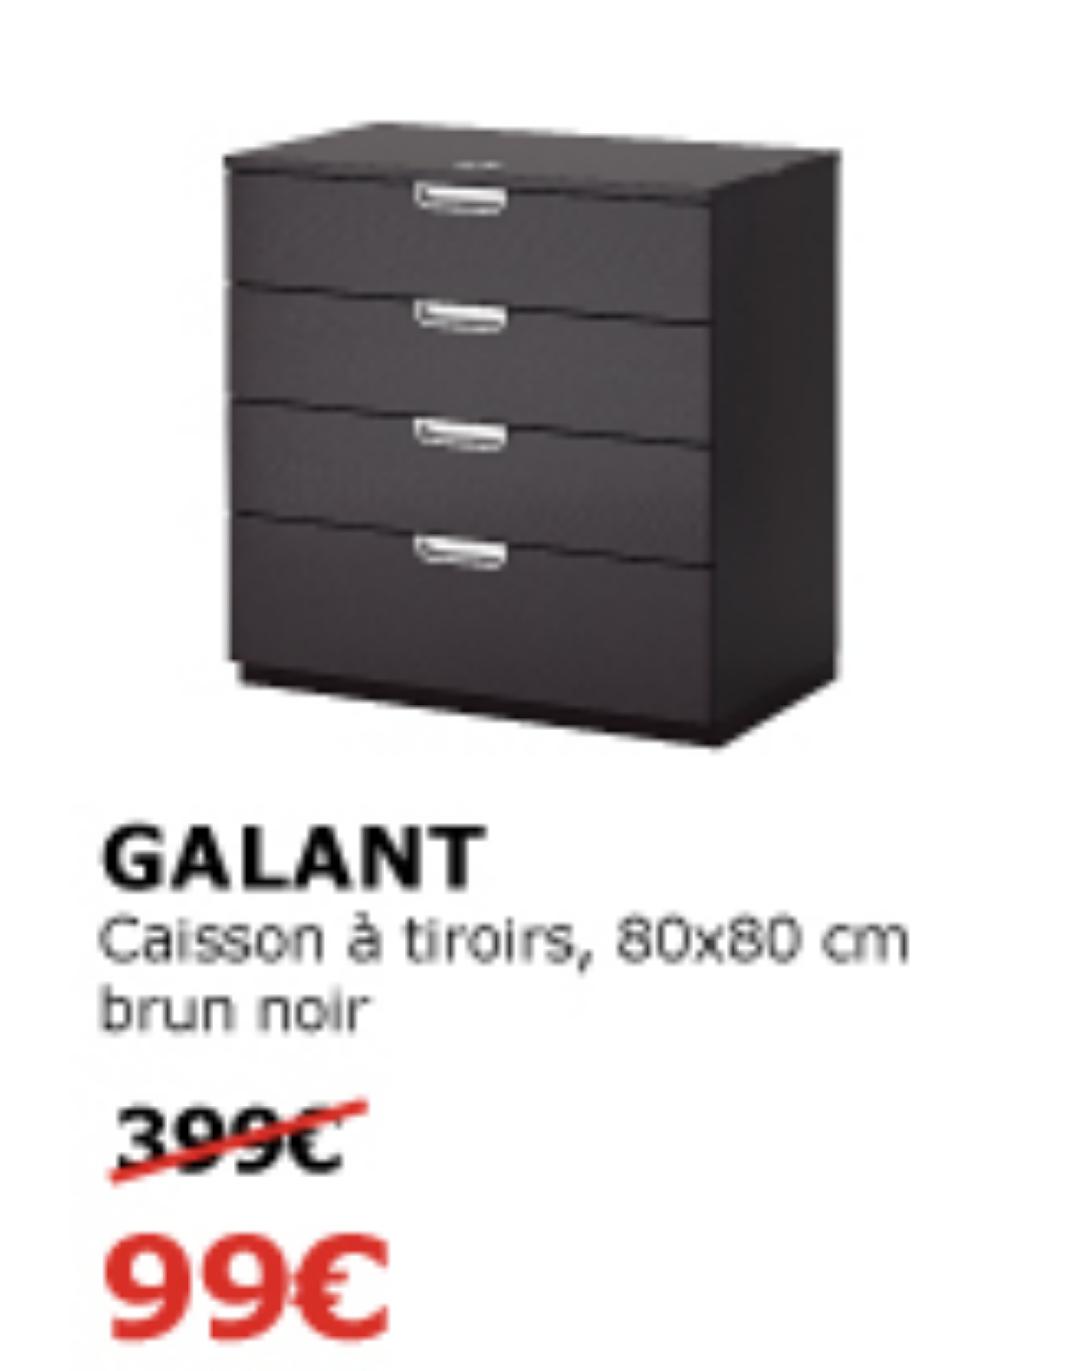 caisson tiroirs galant 80x80 cm vitrolles 13. Black Bedroom Furniture Sets. Home Design Ideas